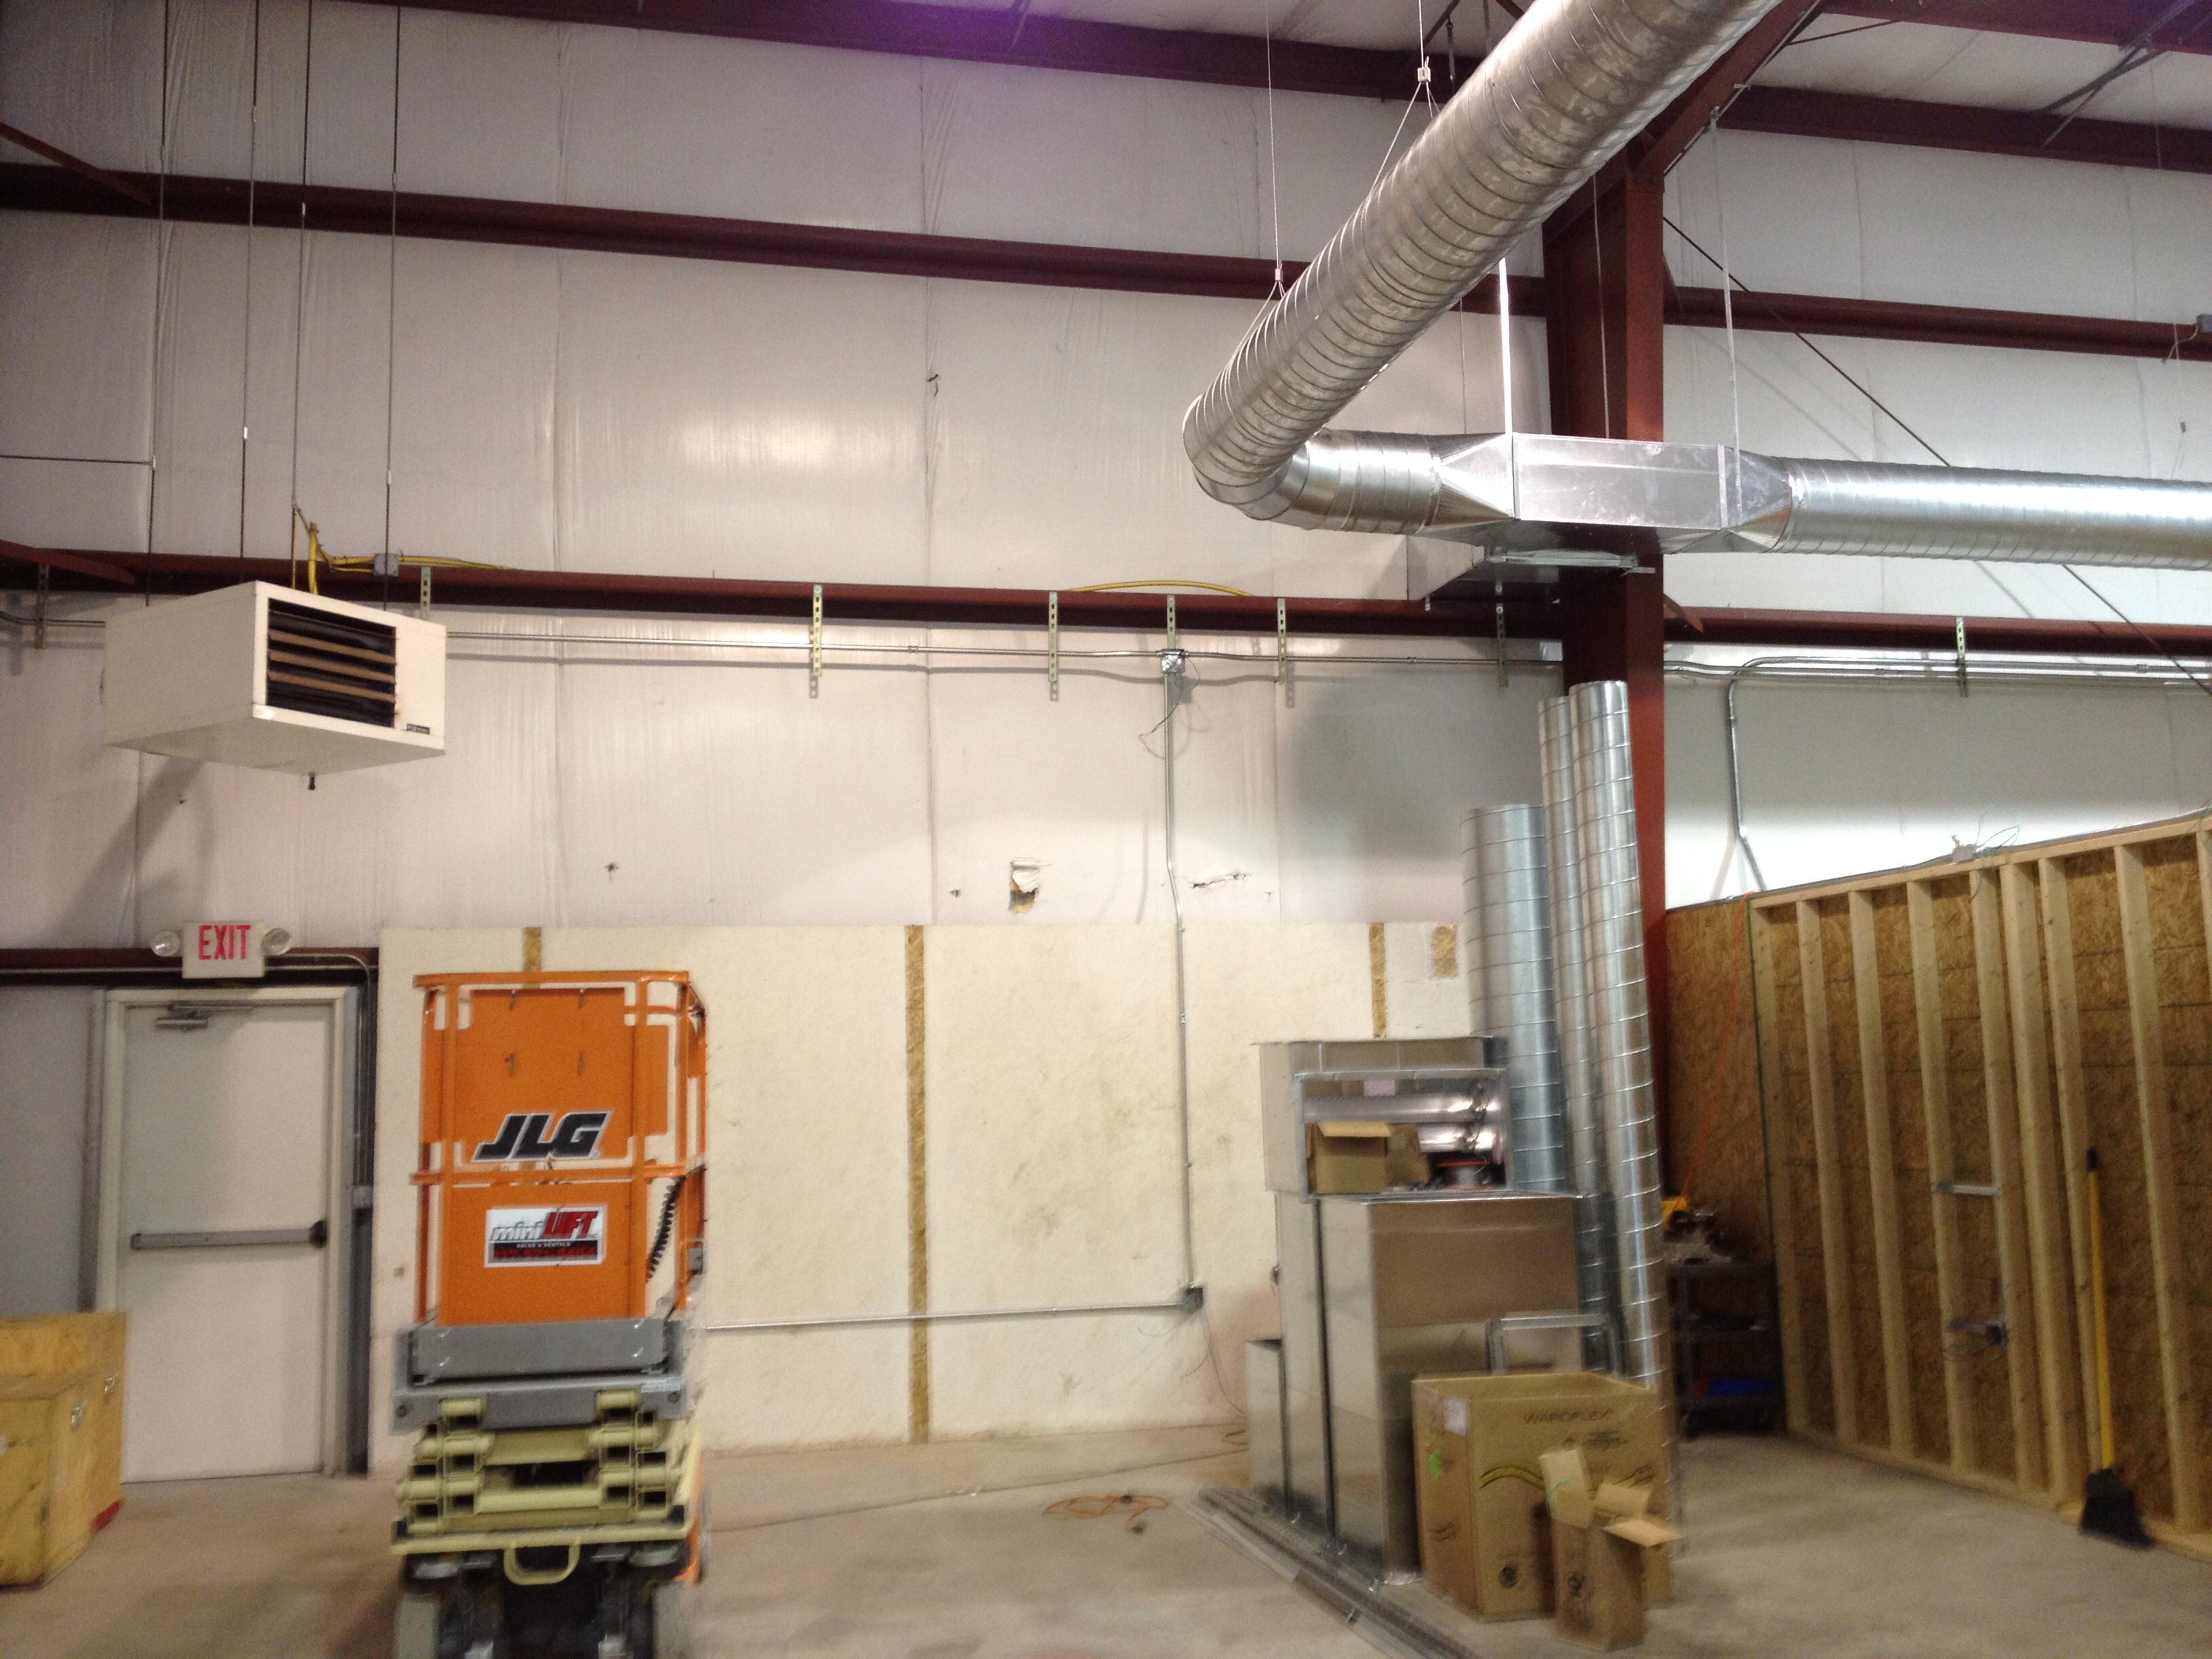 Lighting installation and repair